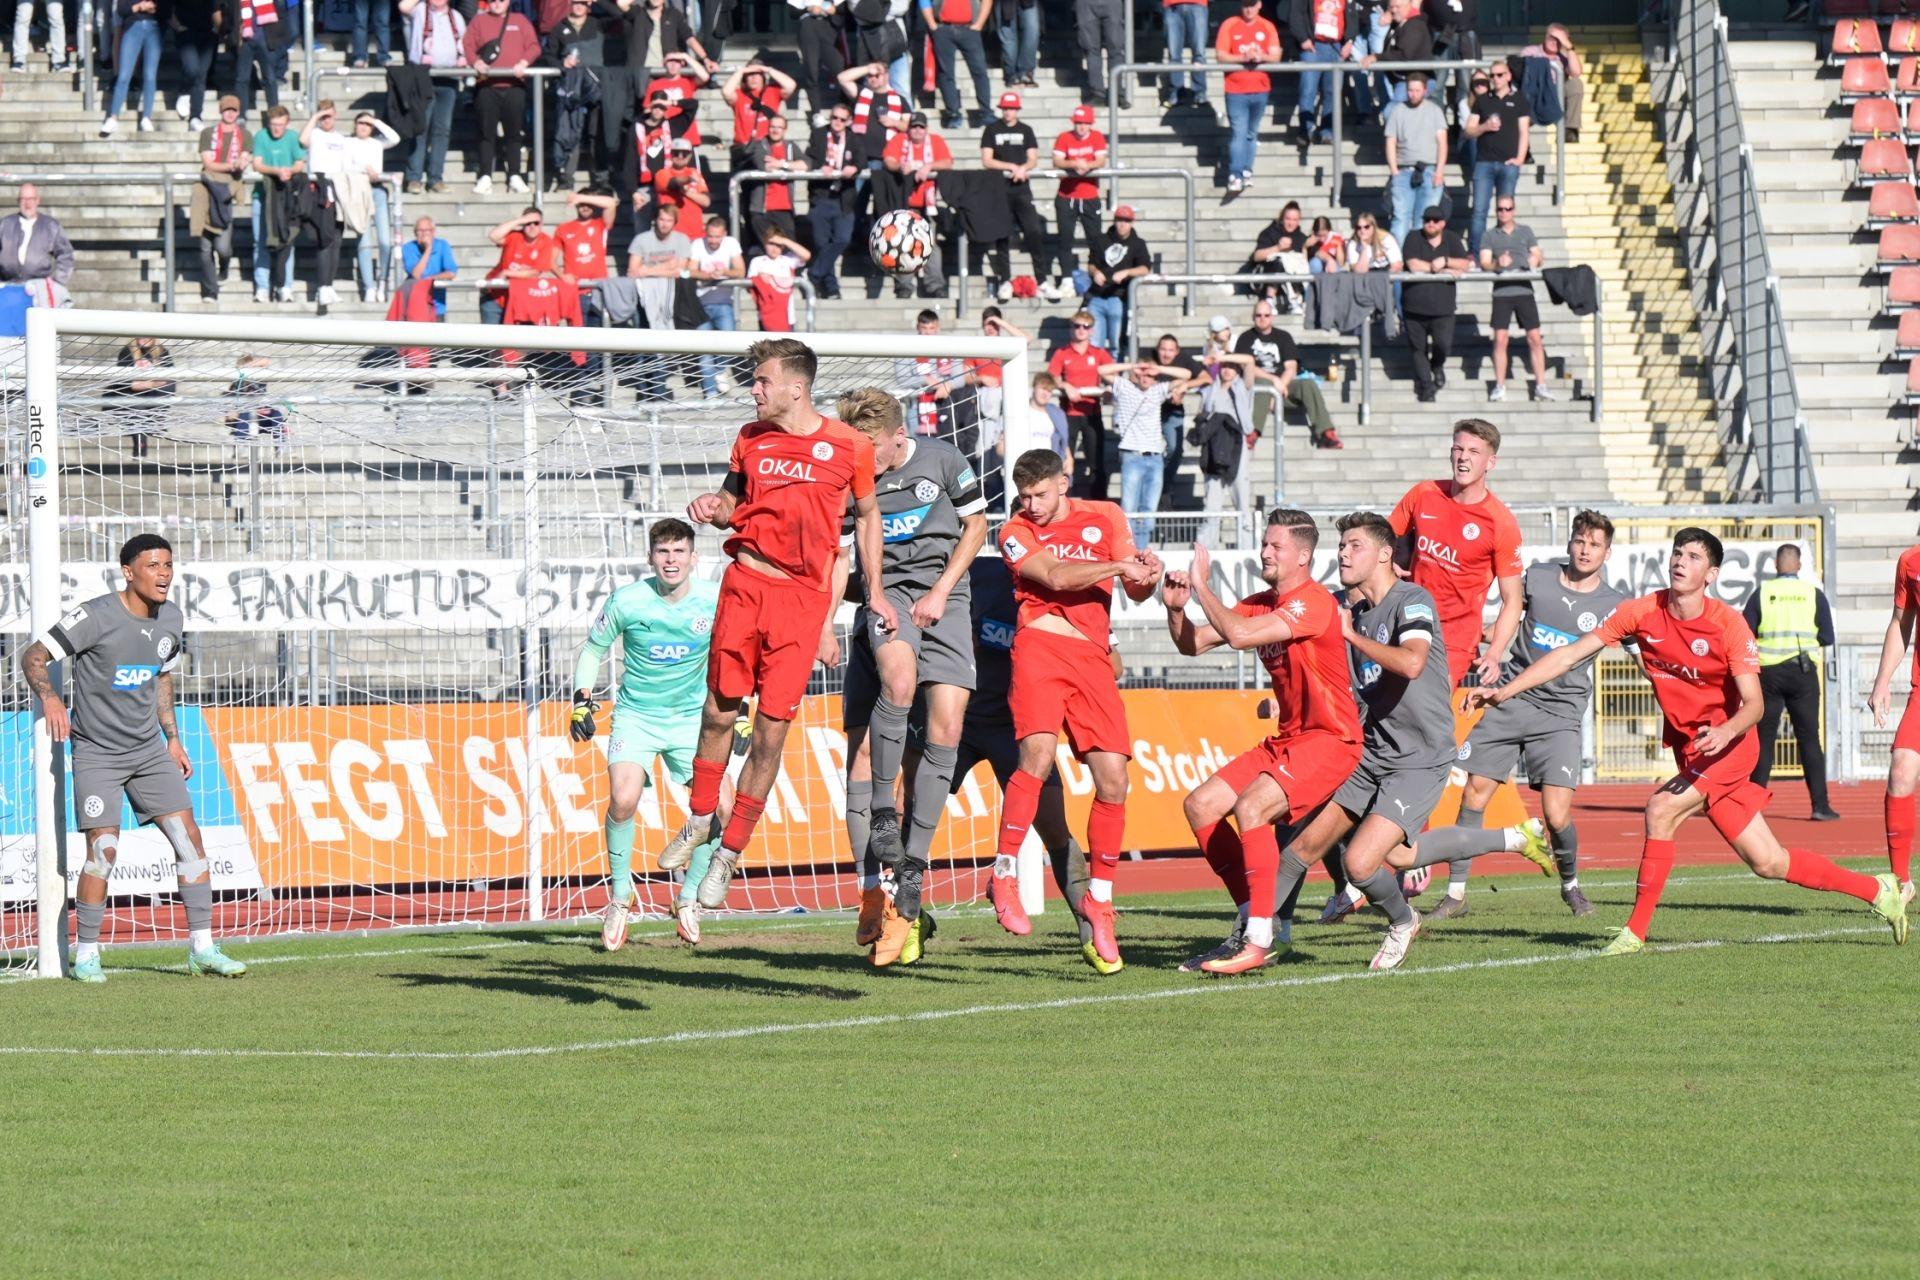 Regionalliga S�dwest, Saison 2021/22, KSV Hessen Kassel, FC Astoria Walldorf, Endsatnd 0:2